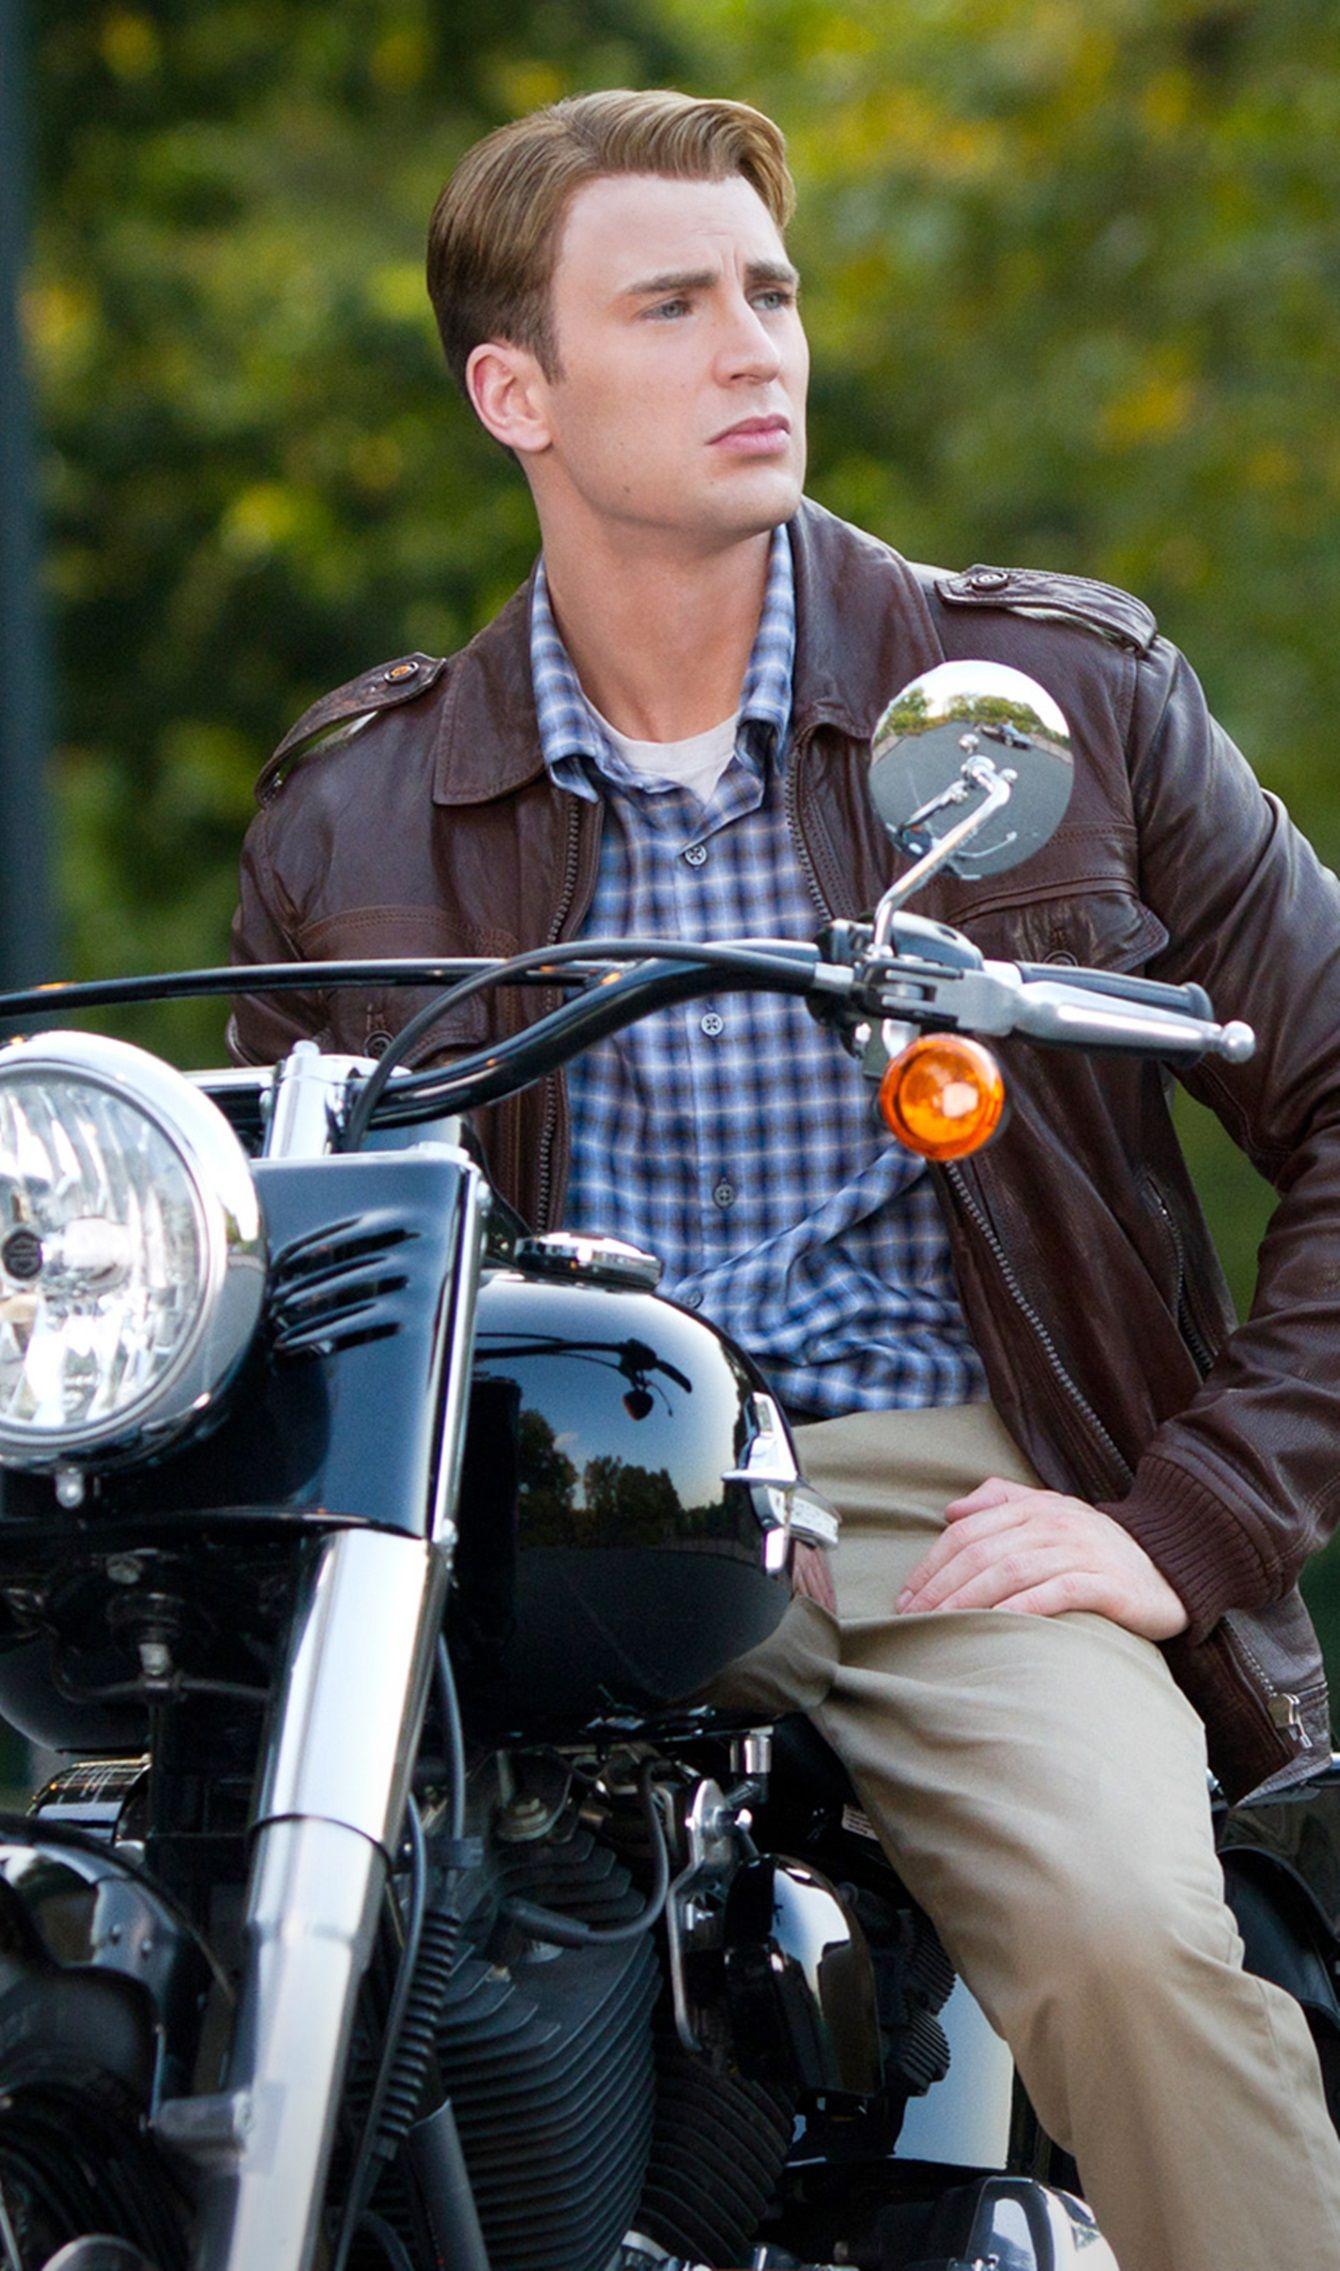 Chris Evans as Steve Rogers in the Avengers. just love how ...